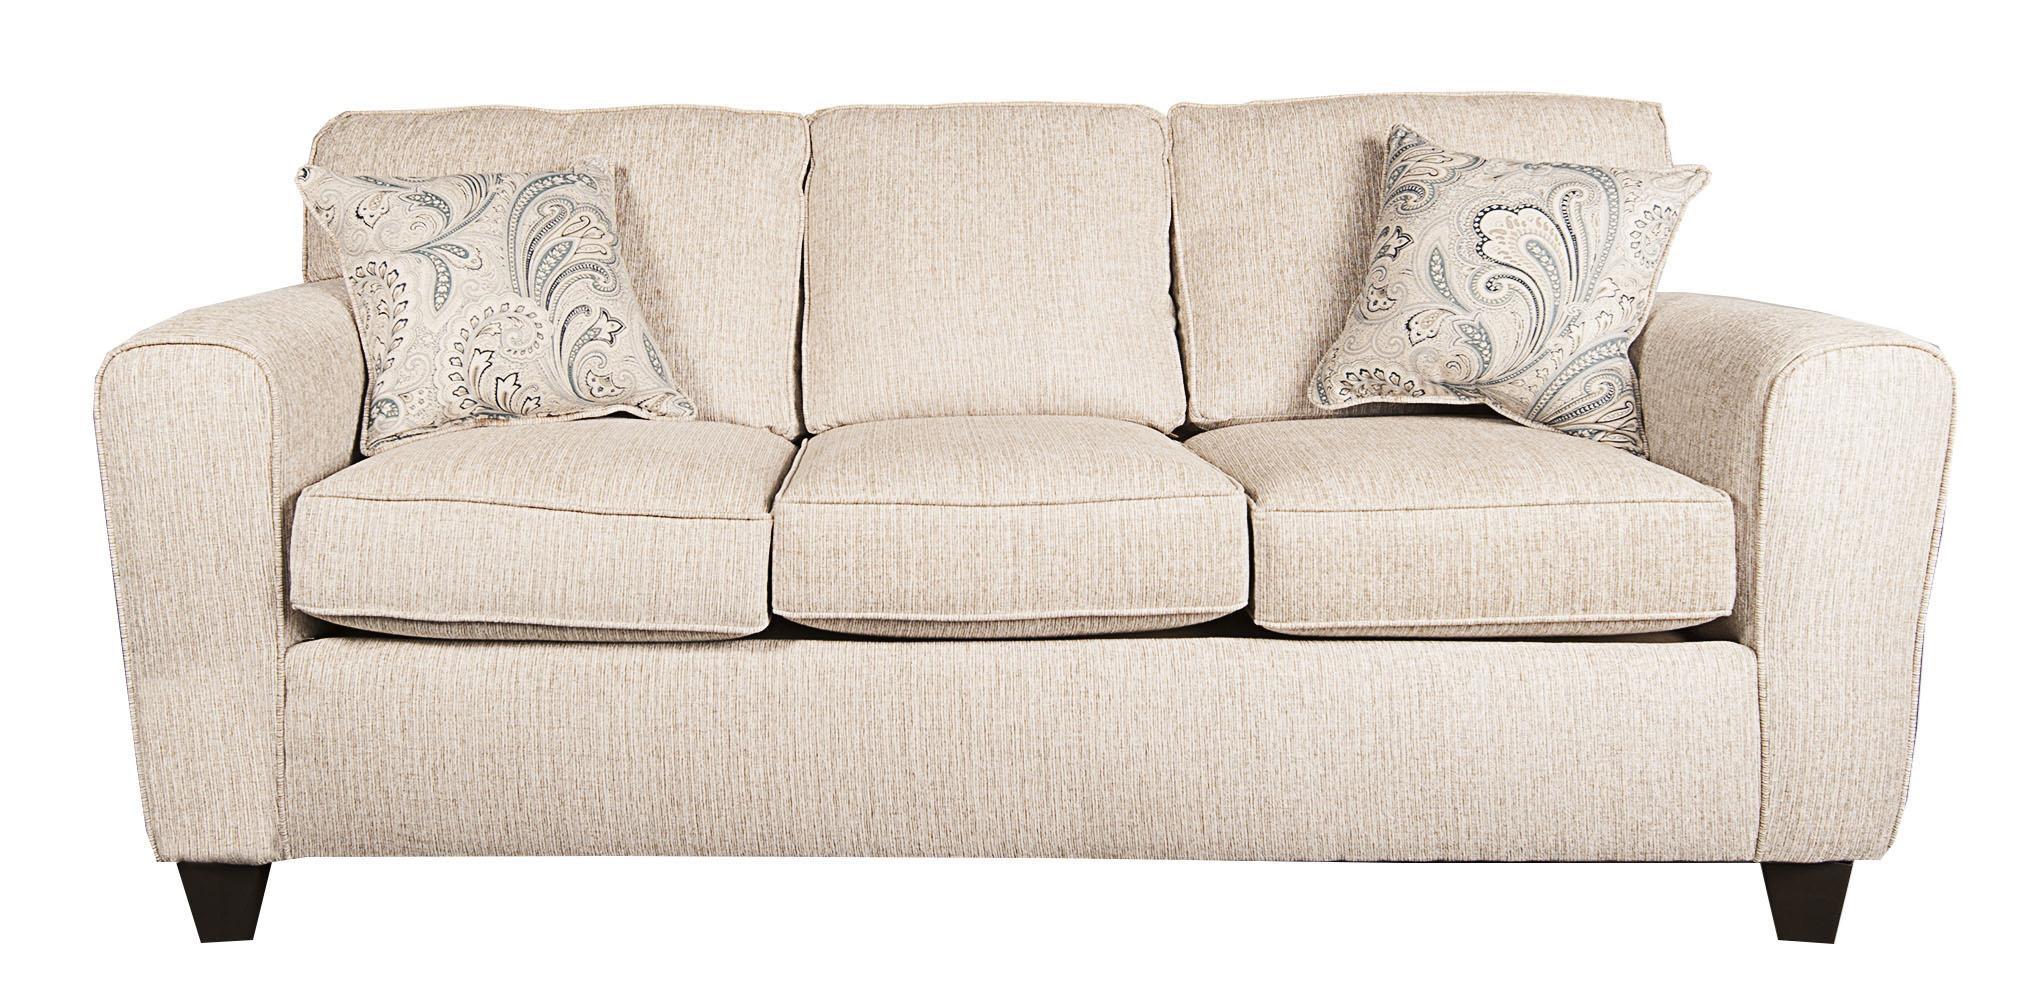 Rexanna Traditional Sofa With Accent Pillows Morris Home Sofas